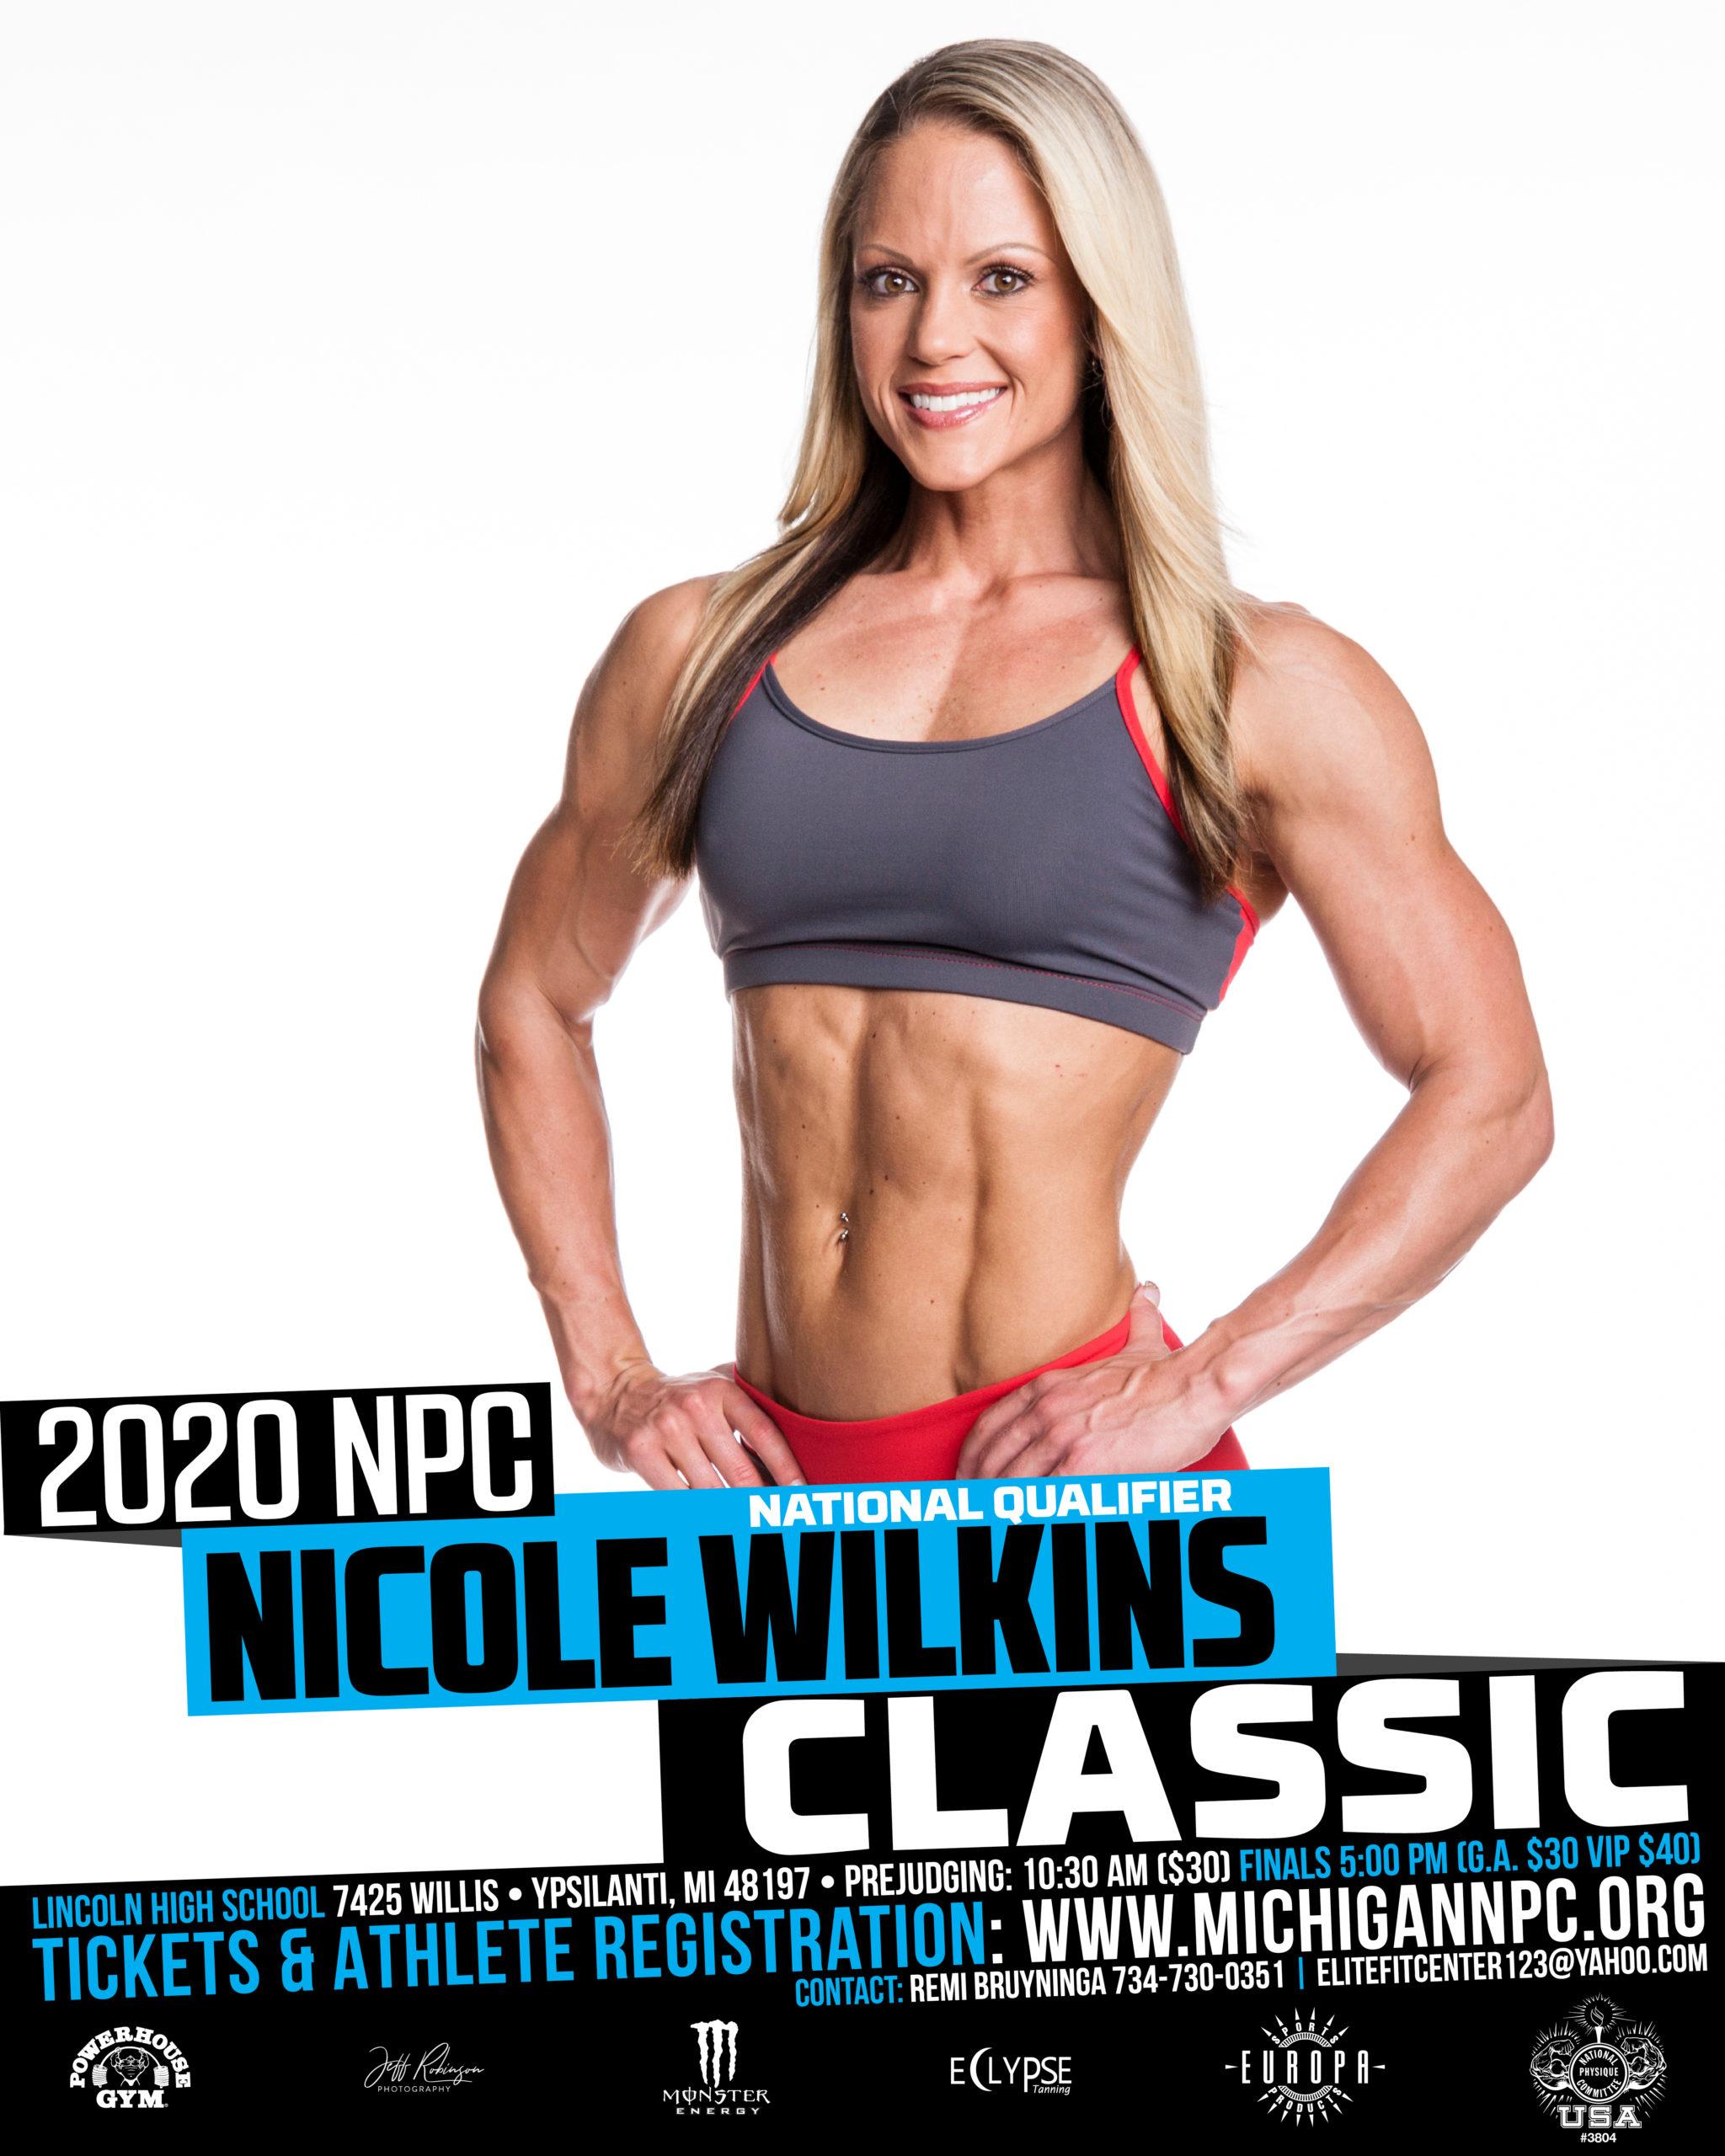 NPC Nicole Wilkins Classic Poster